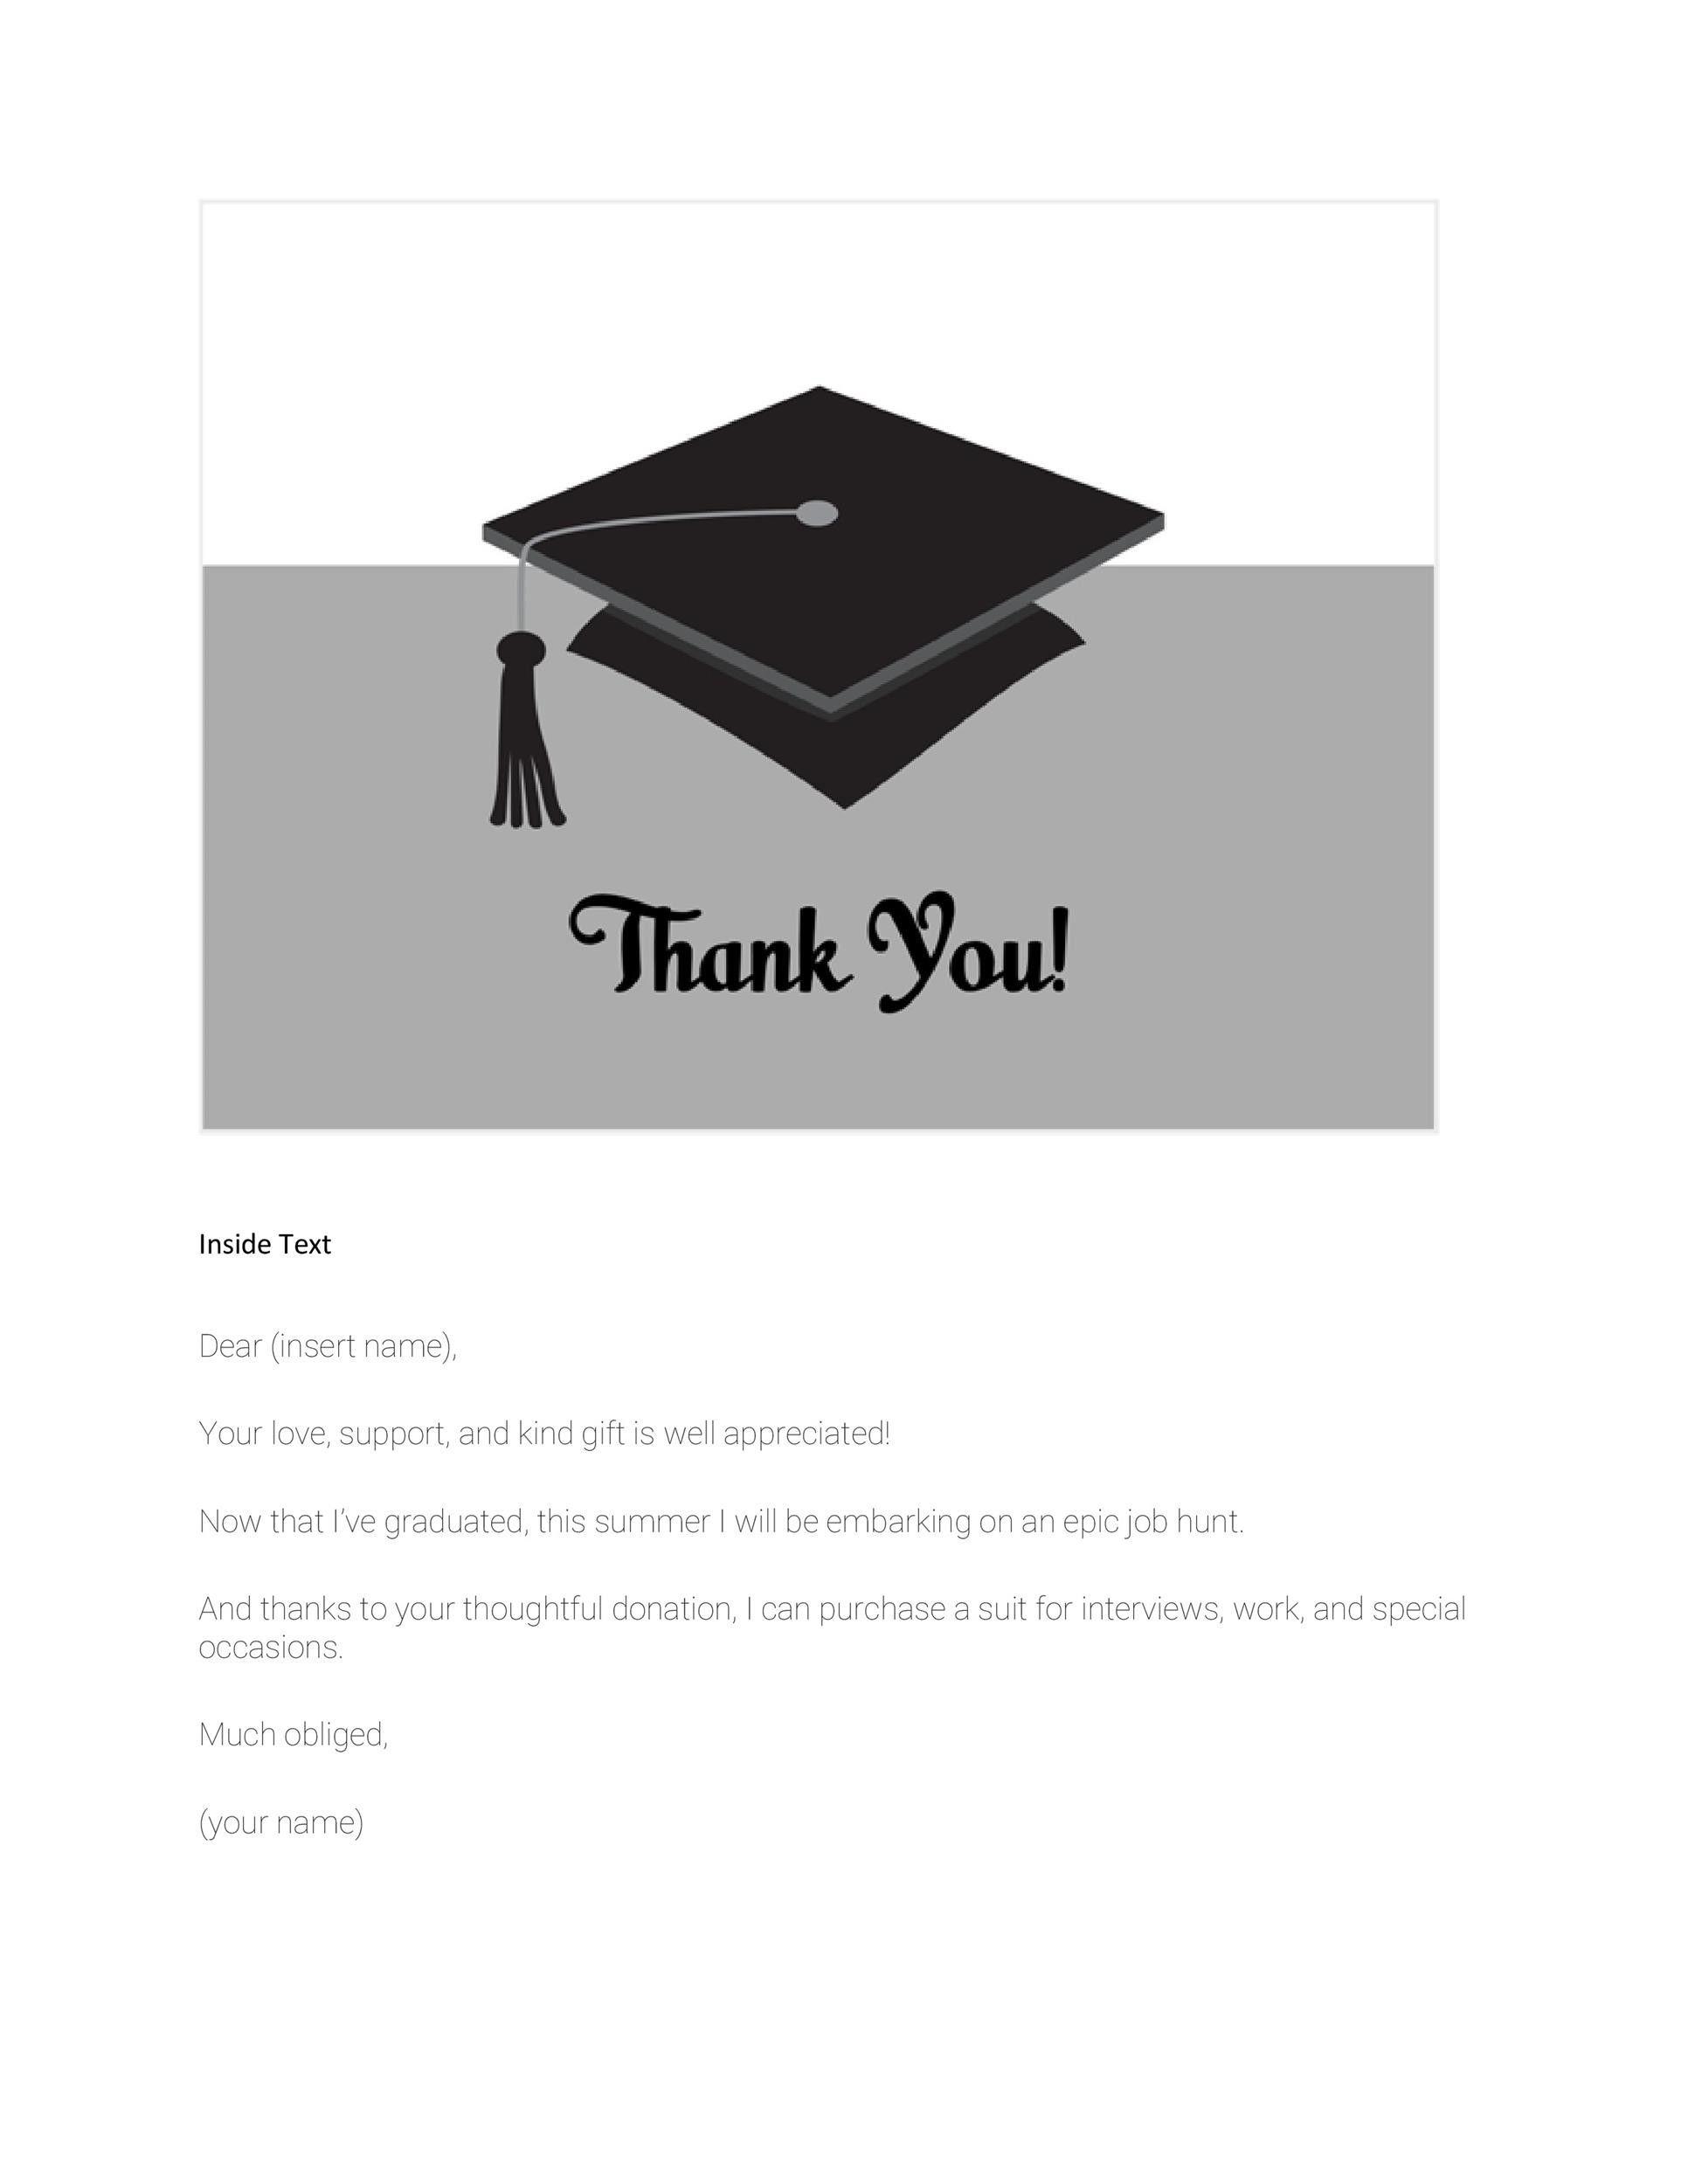 Graduation Name Cards Template Graduation Card Templates Thank You Card Template Note Card Template